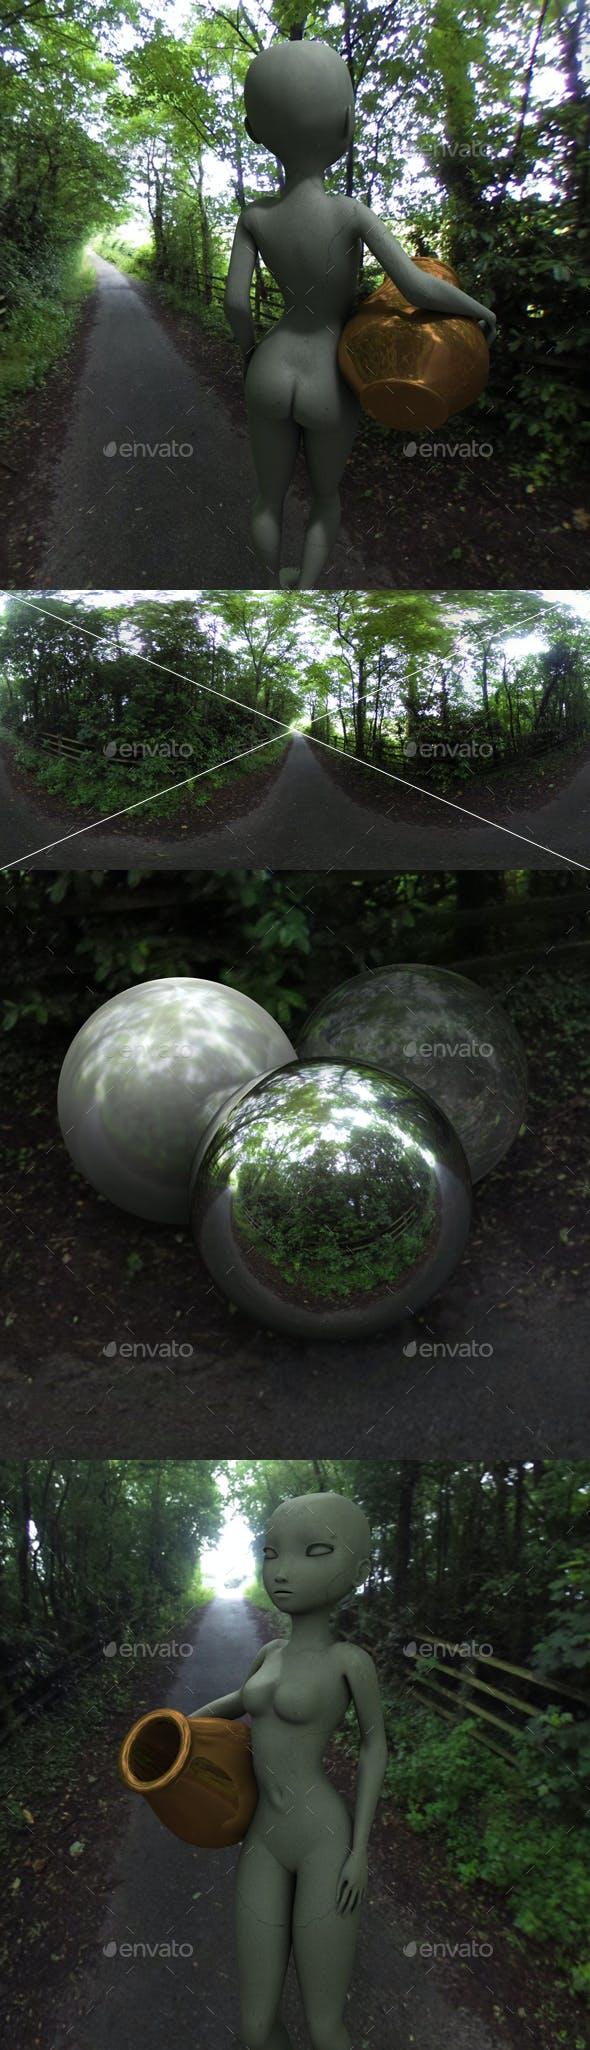 Country Lane HDRI - 3DOcean Item for Sale